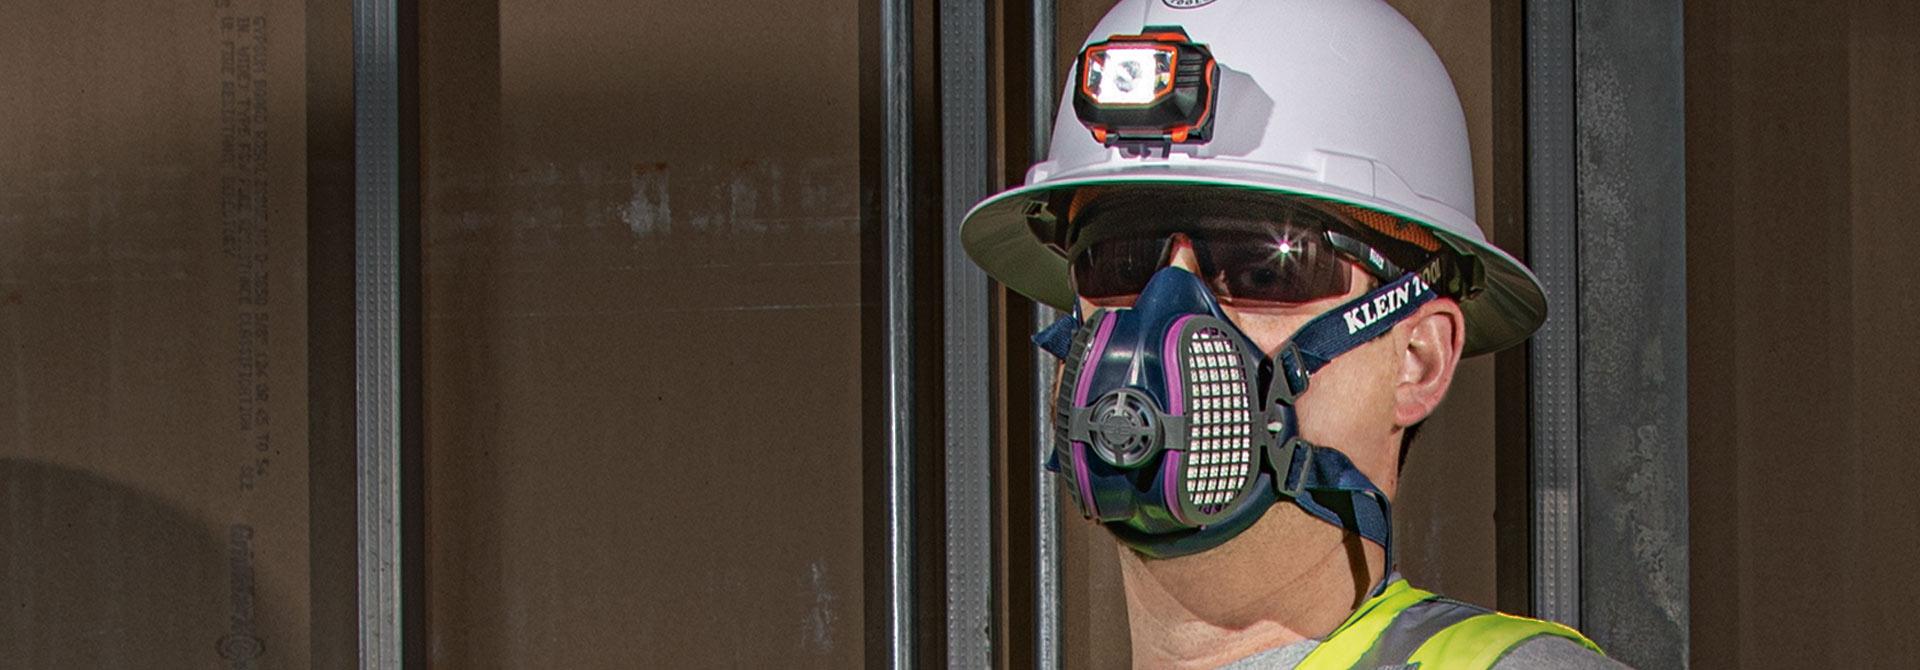 P100 Half-Mask \r\nRespirators